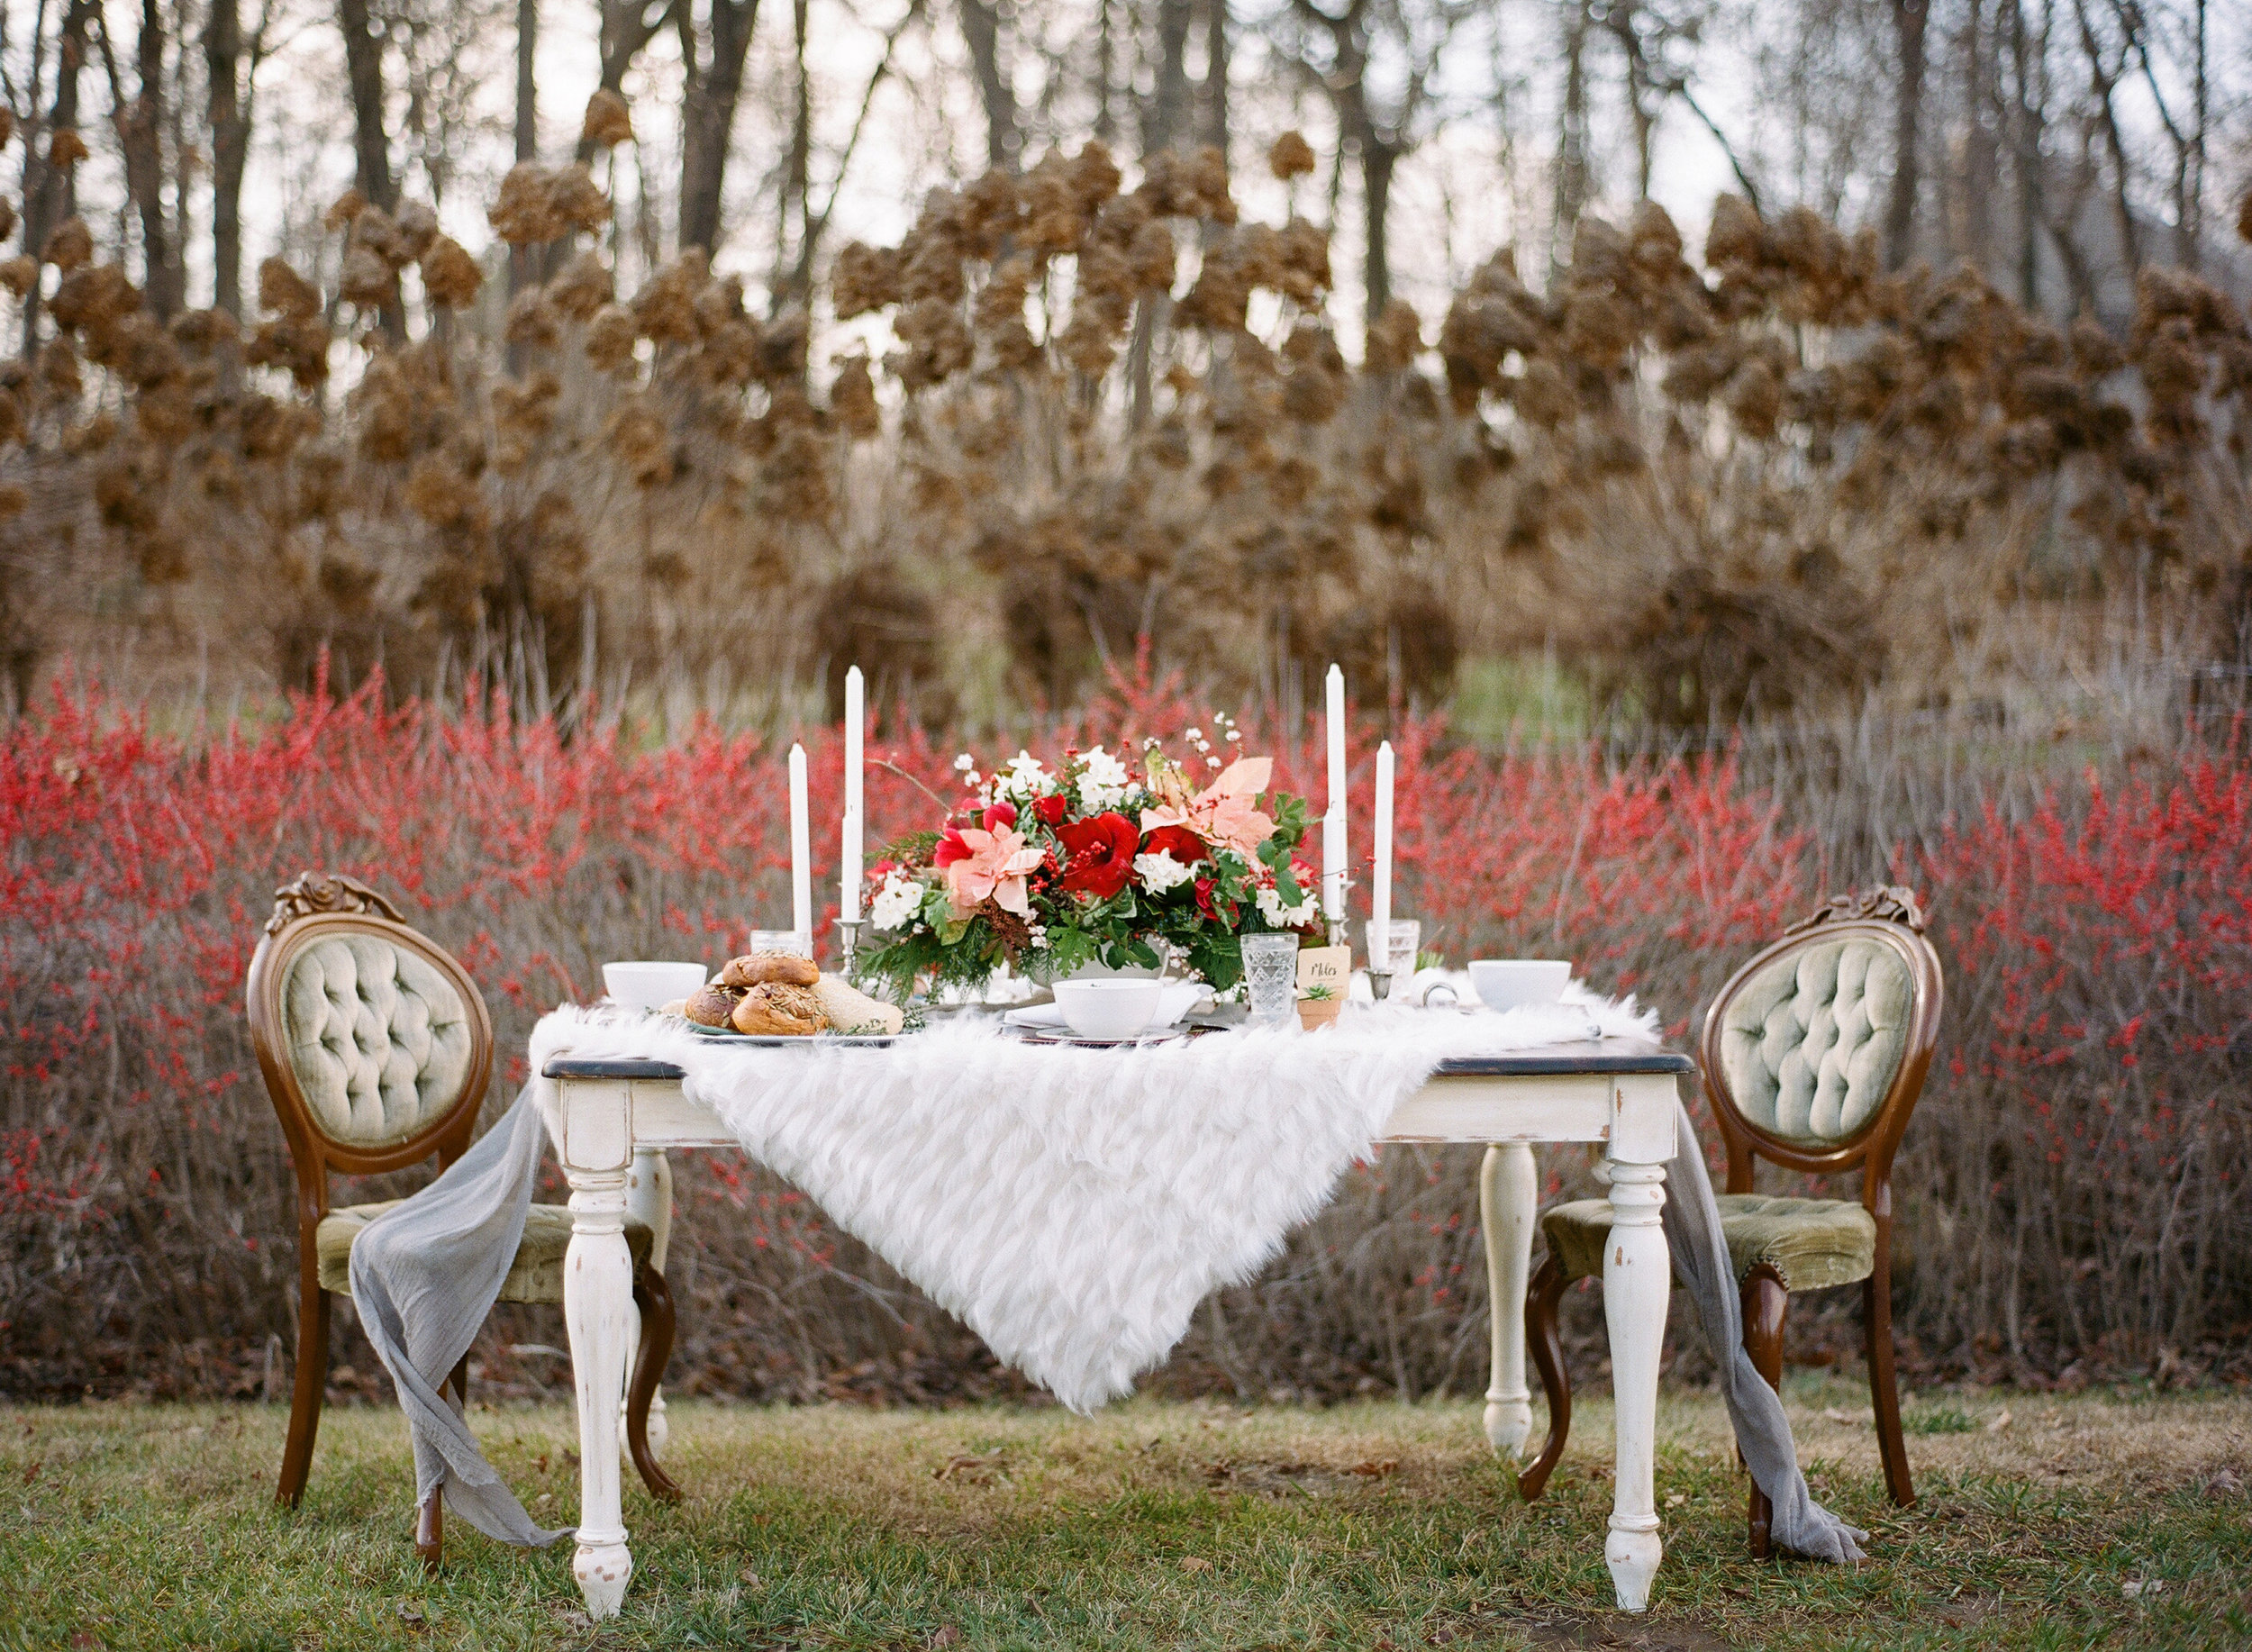 007_Floral_Winter.jpg